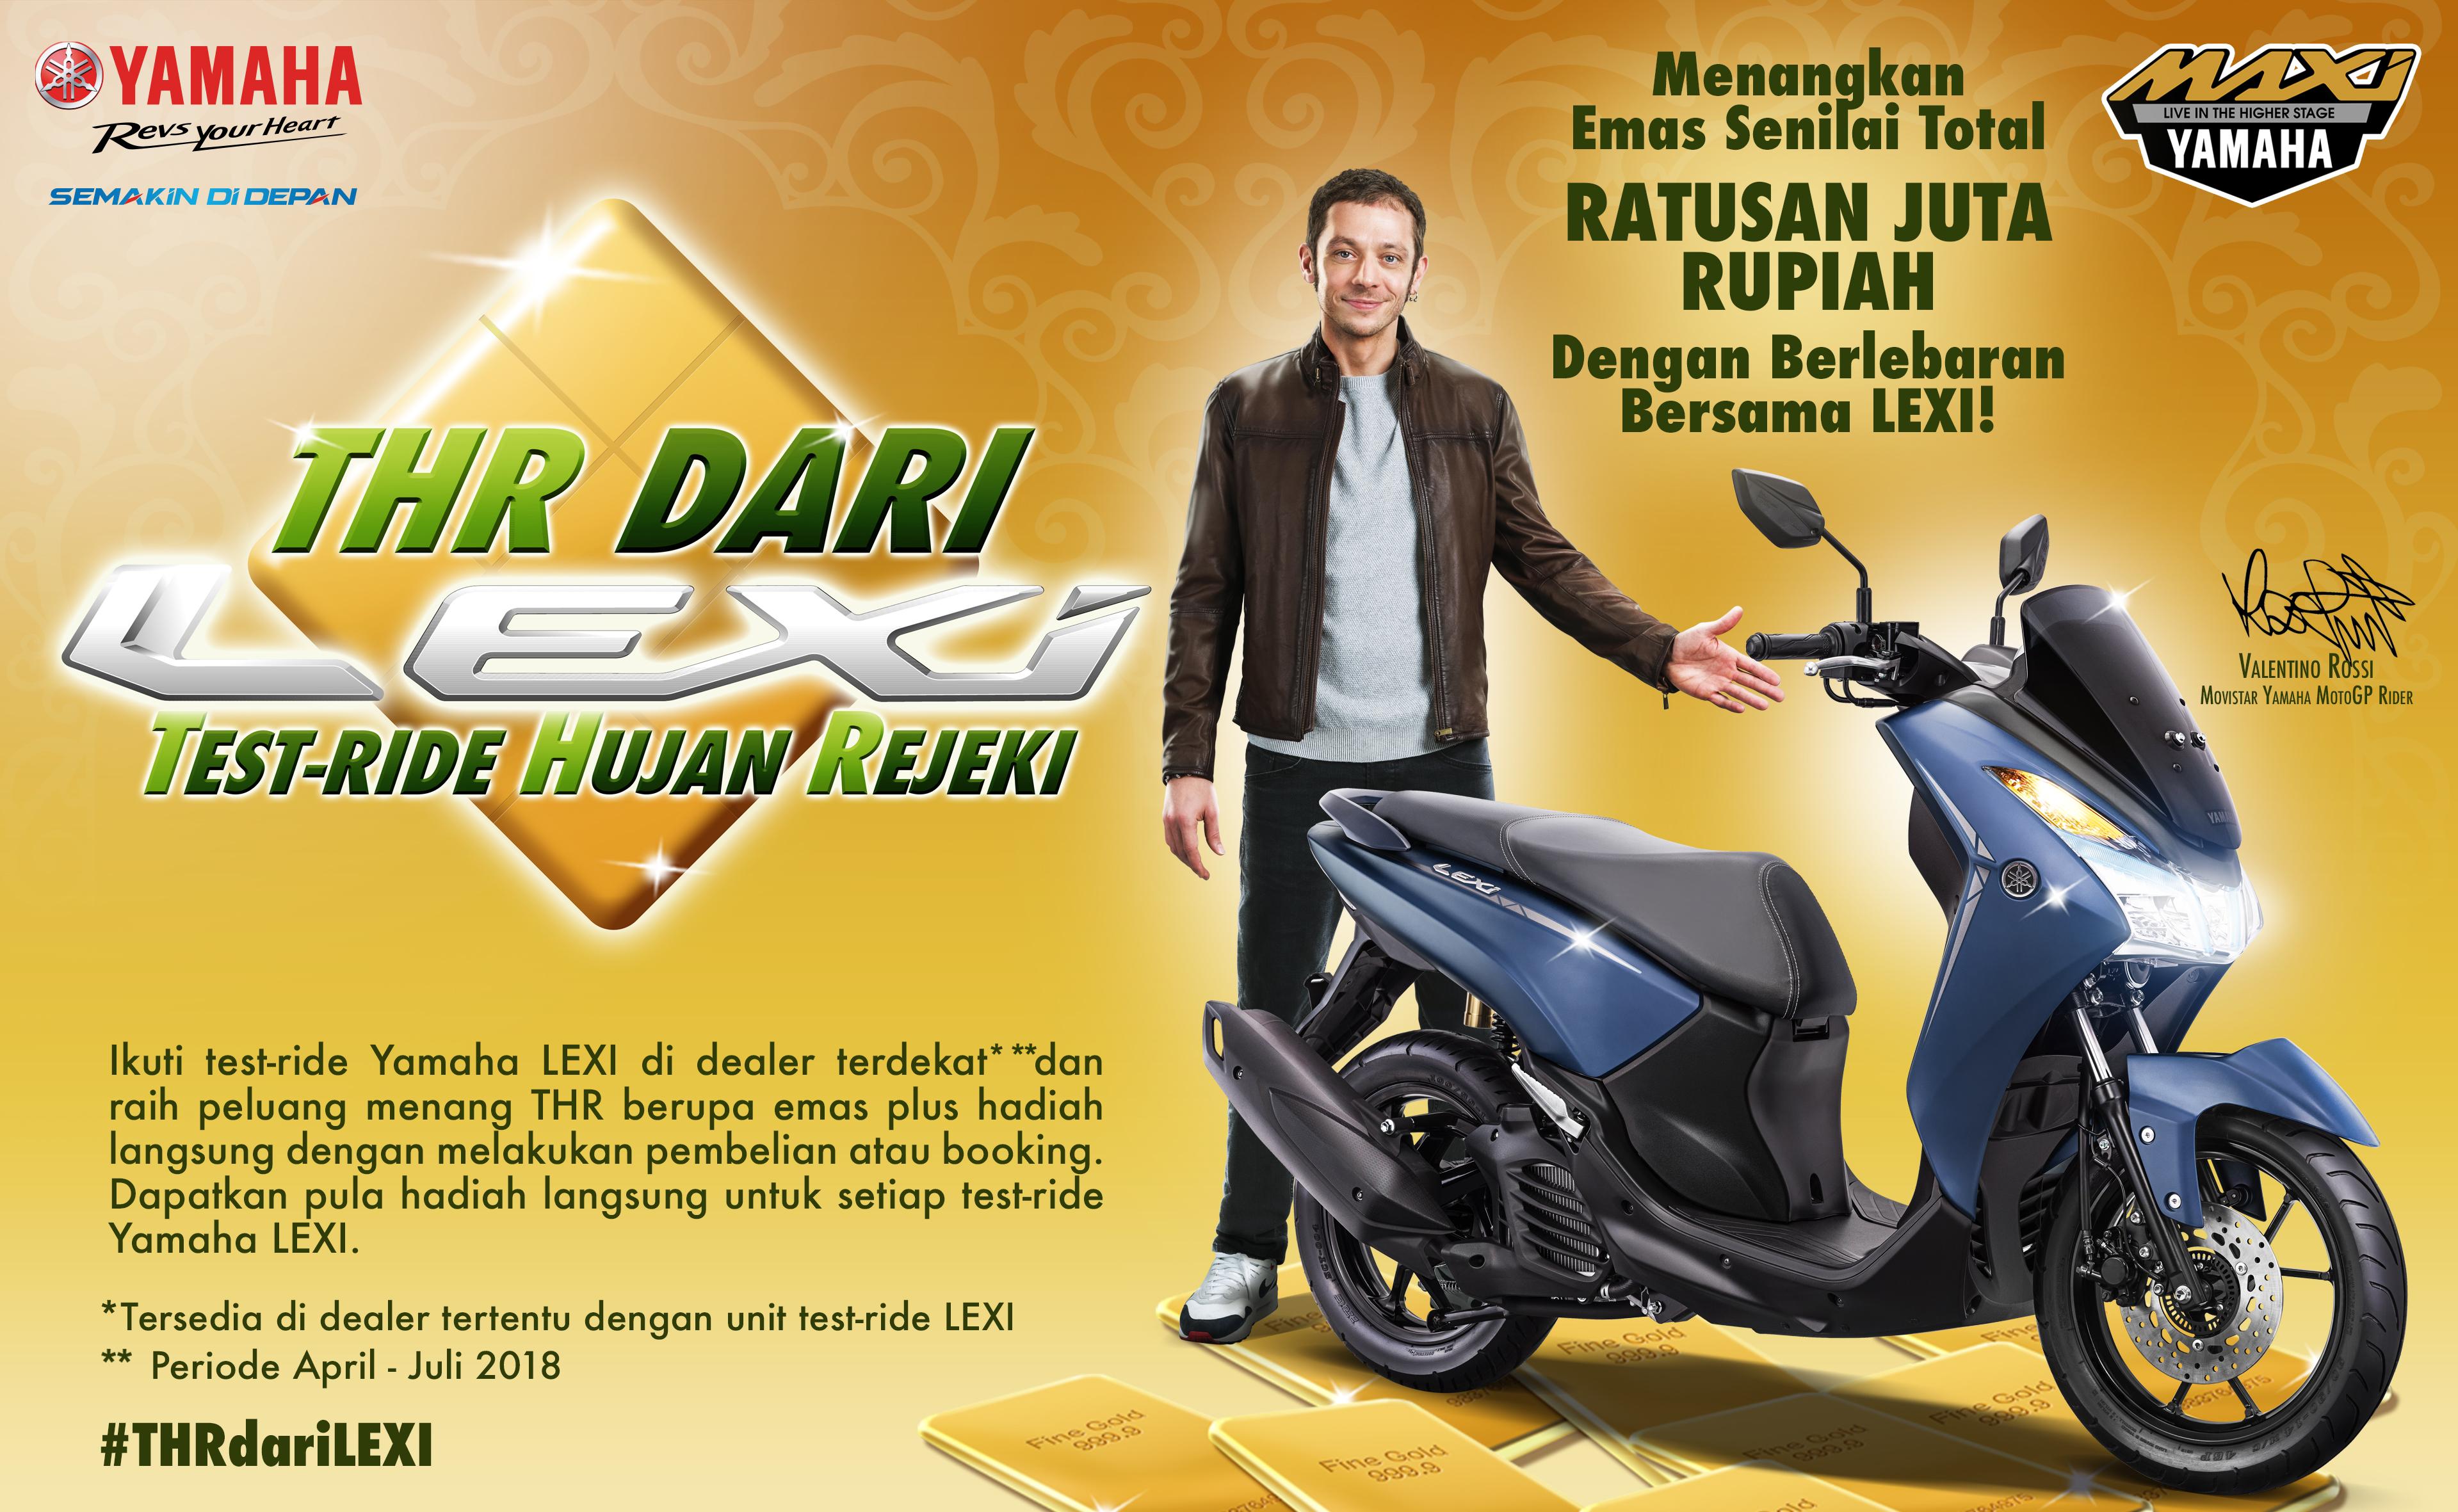 Https 2018 11 20 Beruntung 63 Pemenang Dp Uang Muka 25 Yamaha Aerox Std Kredit Leasing Hitam 17 Bulan Print Ad Horisontal Revisi